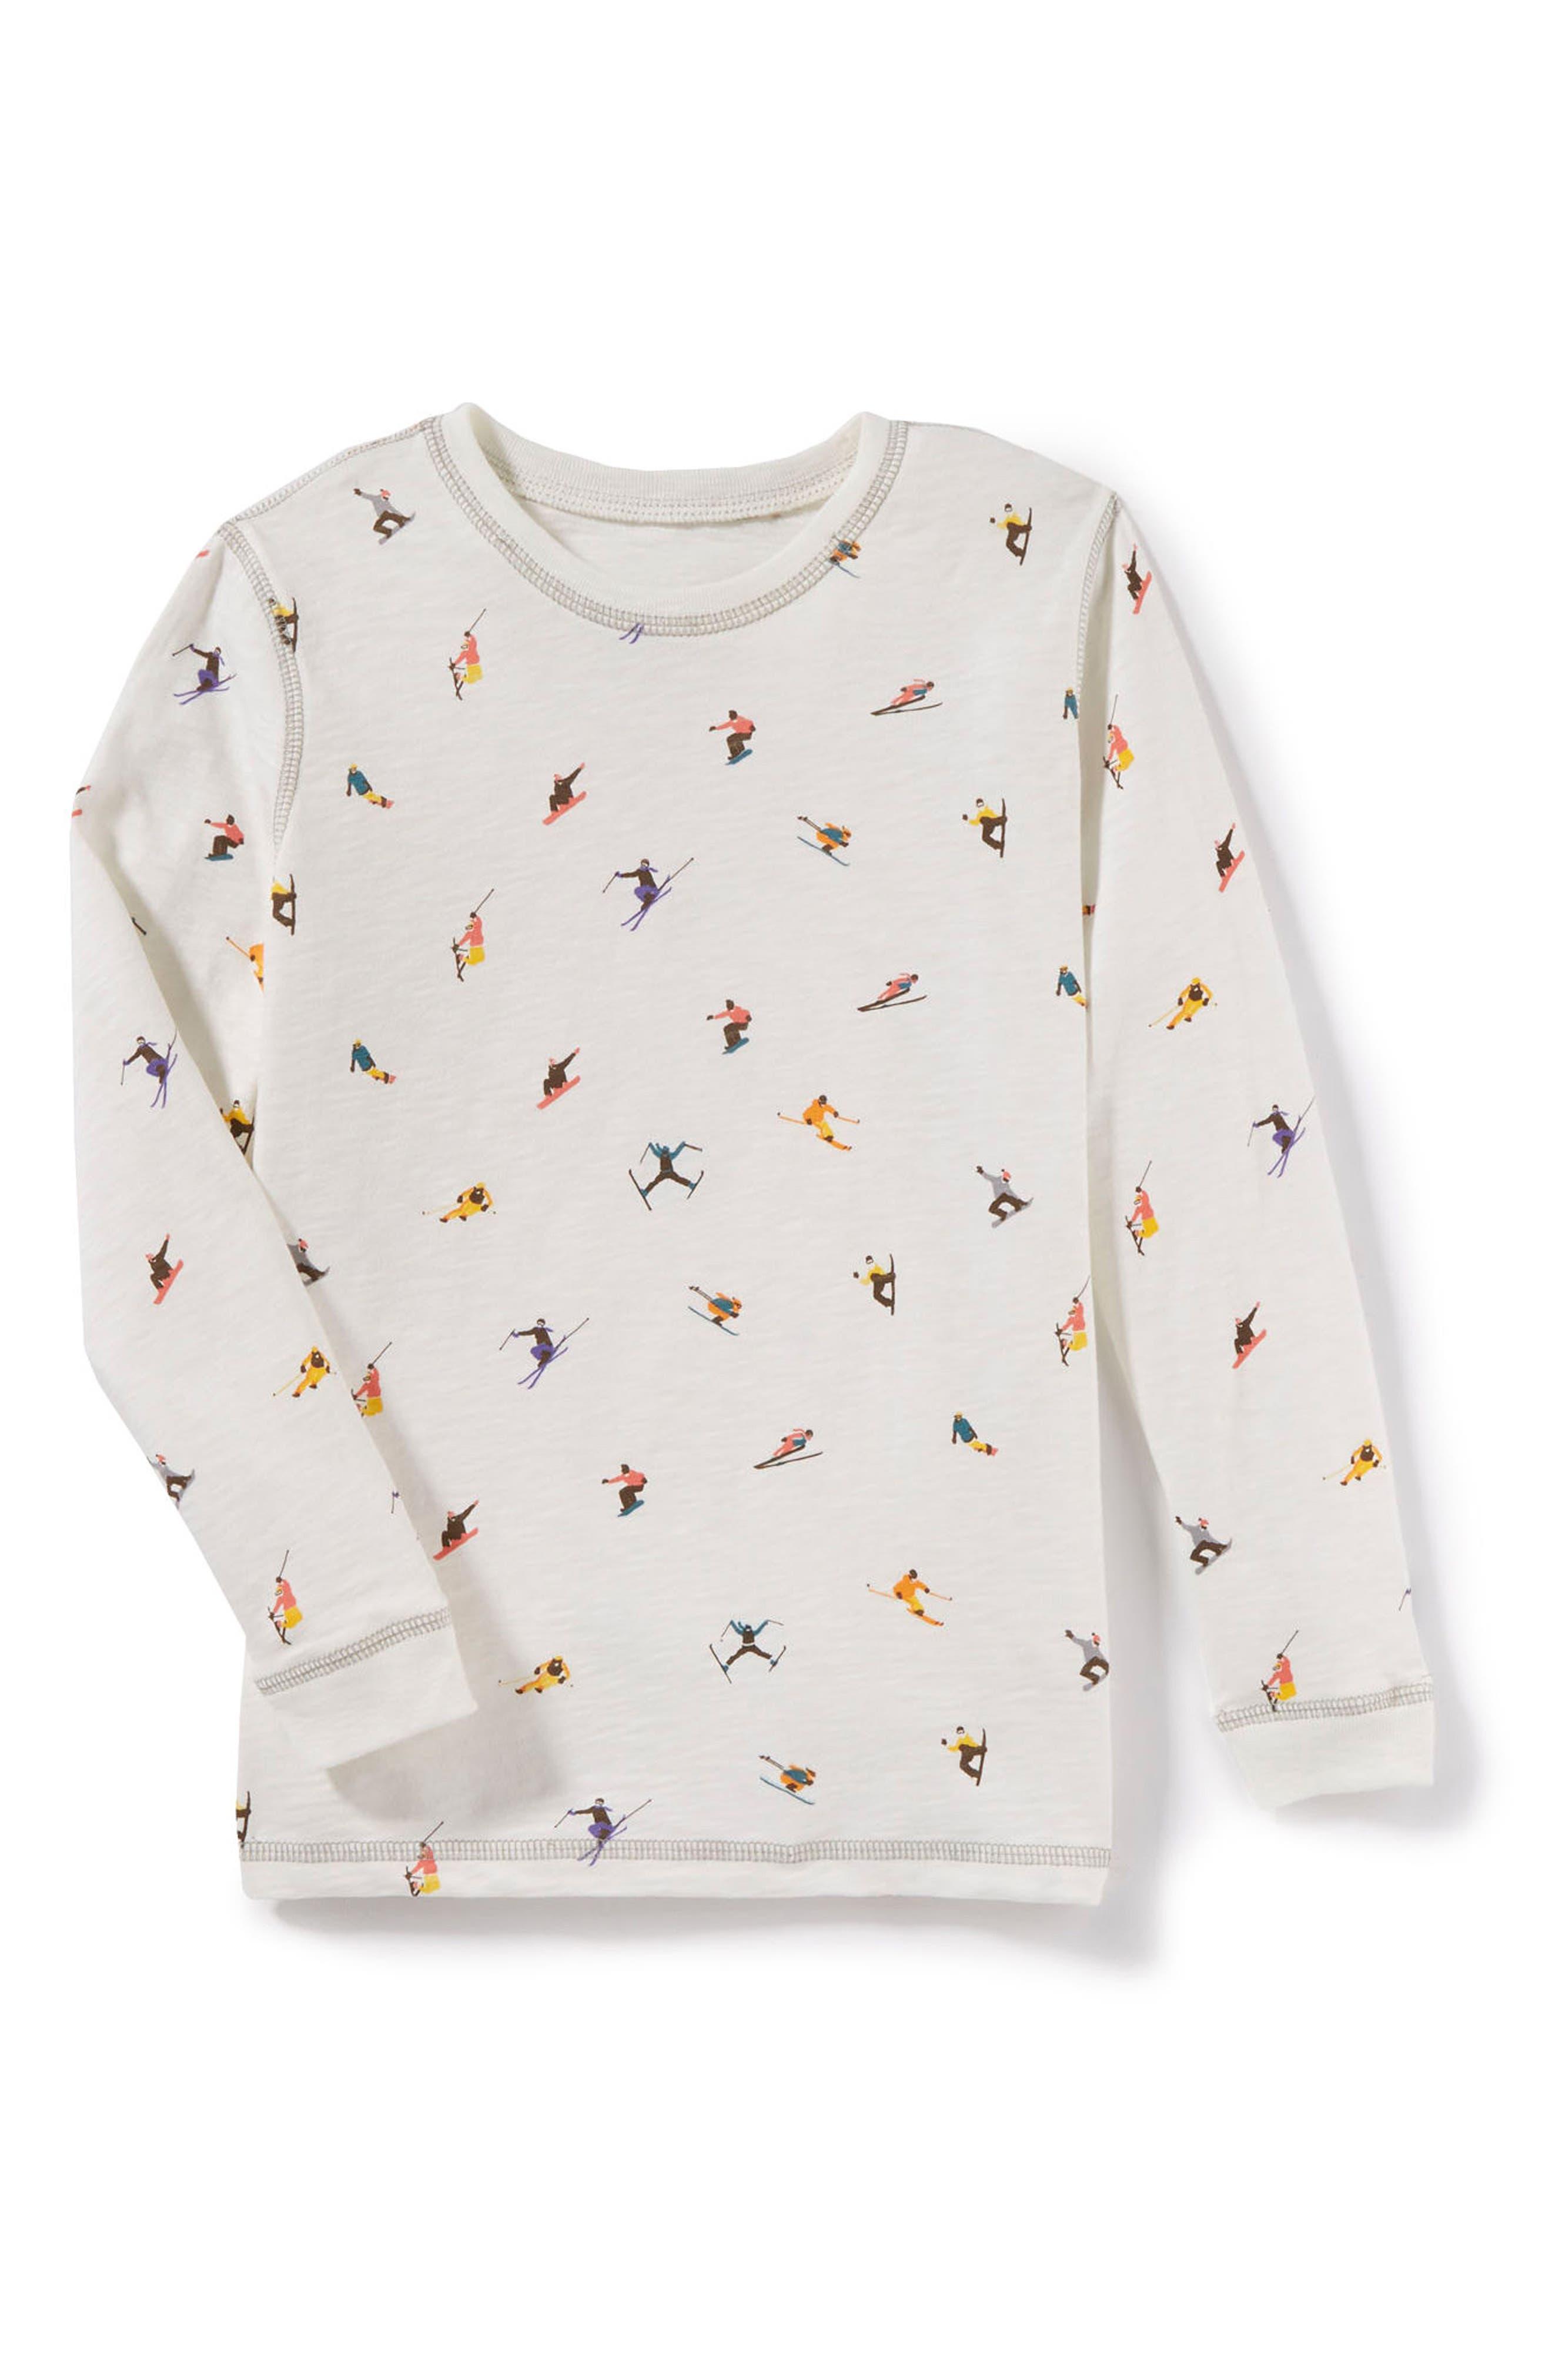 Main Image - Peek Ski Long Sleeve T-Shirt (Toddler Boys, Little Boys & Big Boys)